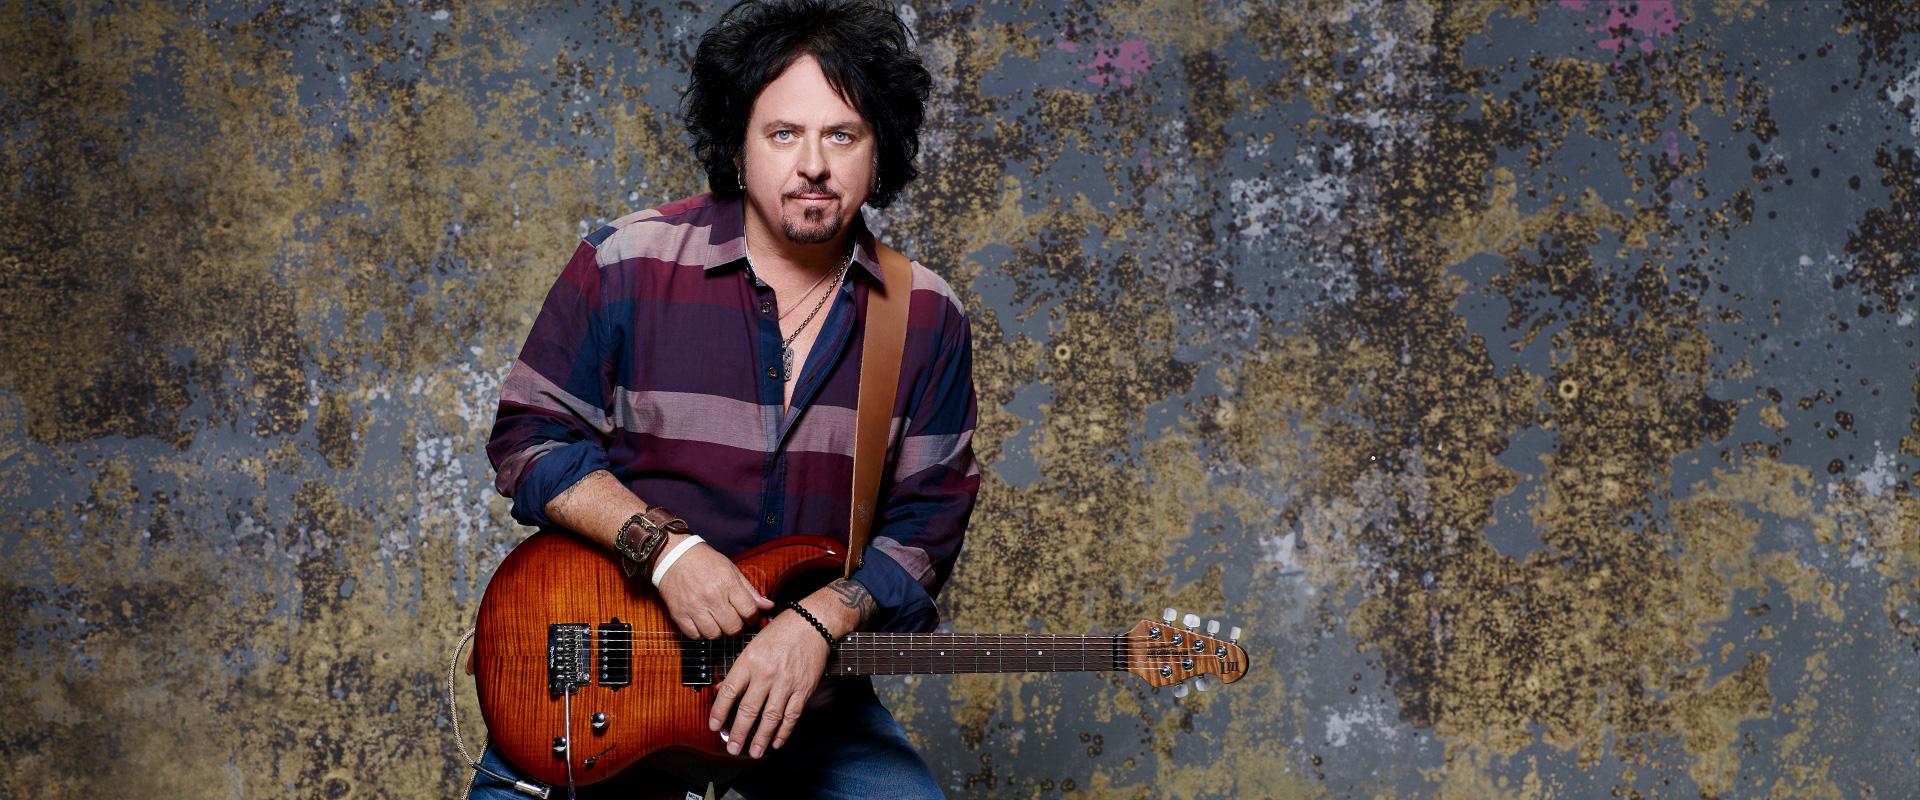 Steve Lukather for DiMarzio